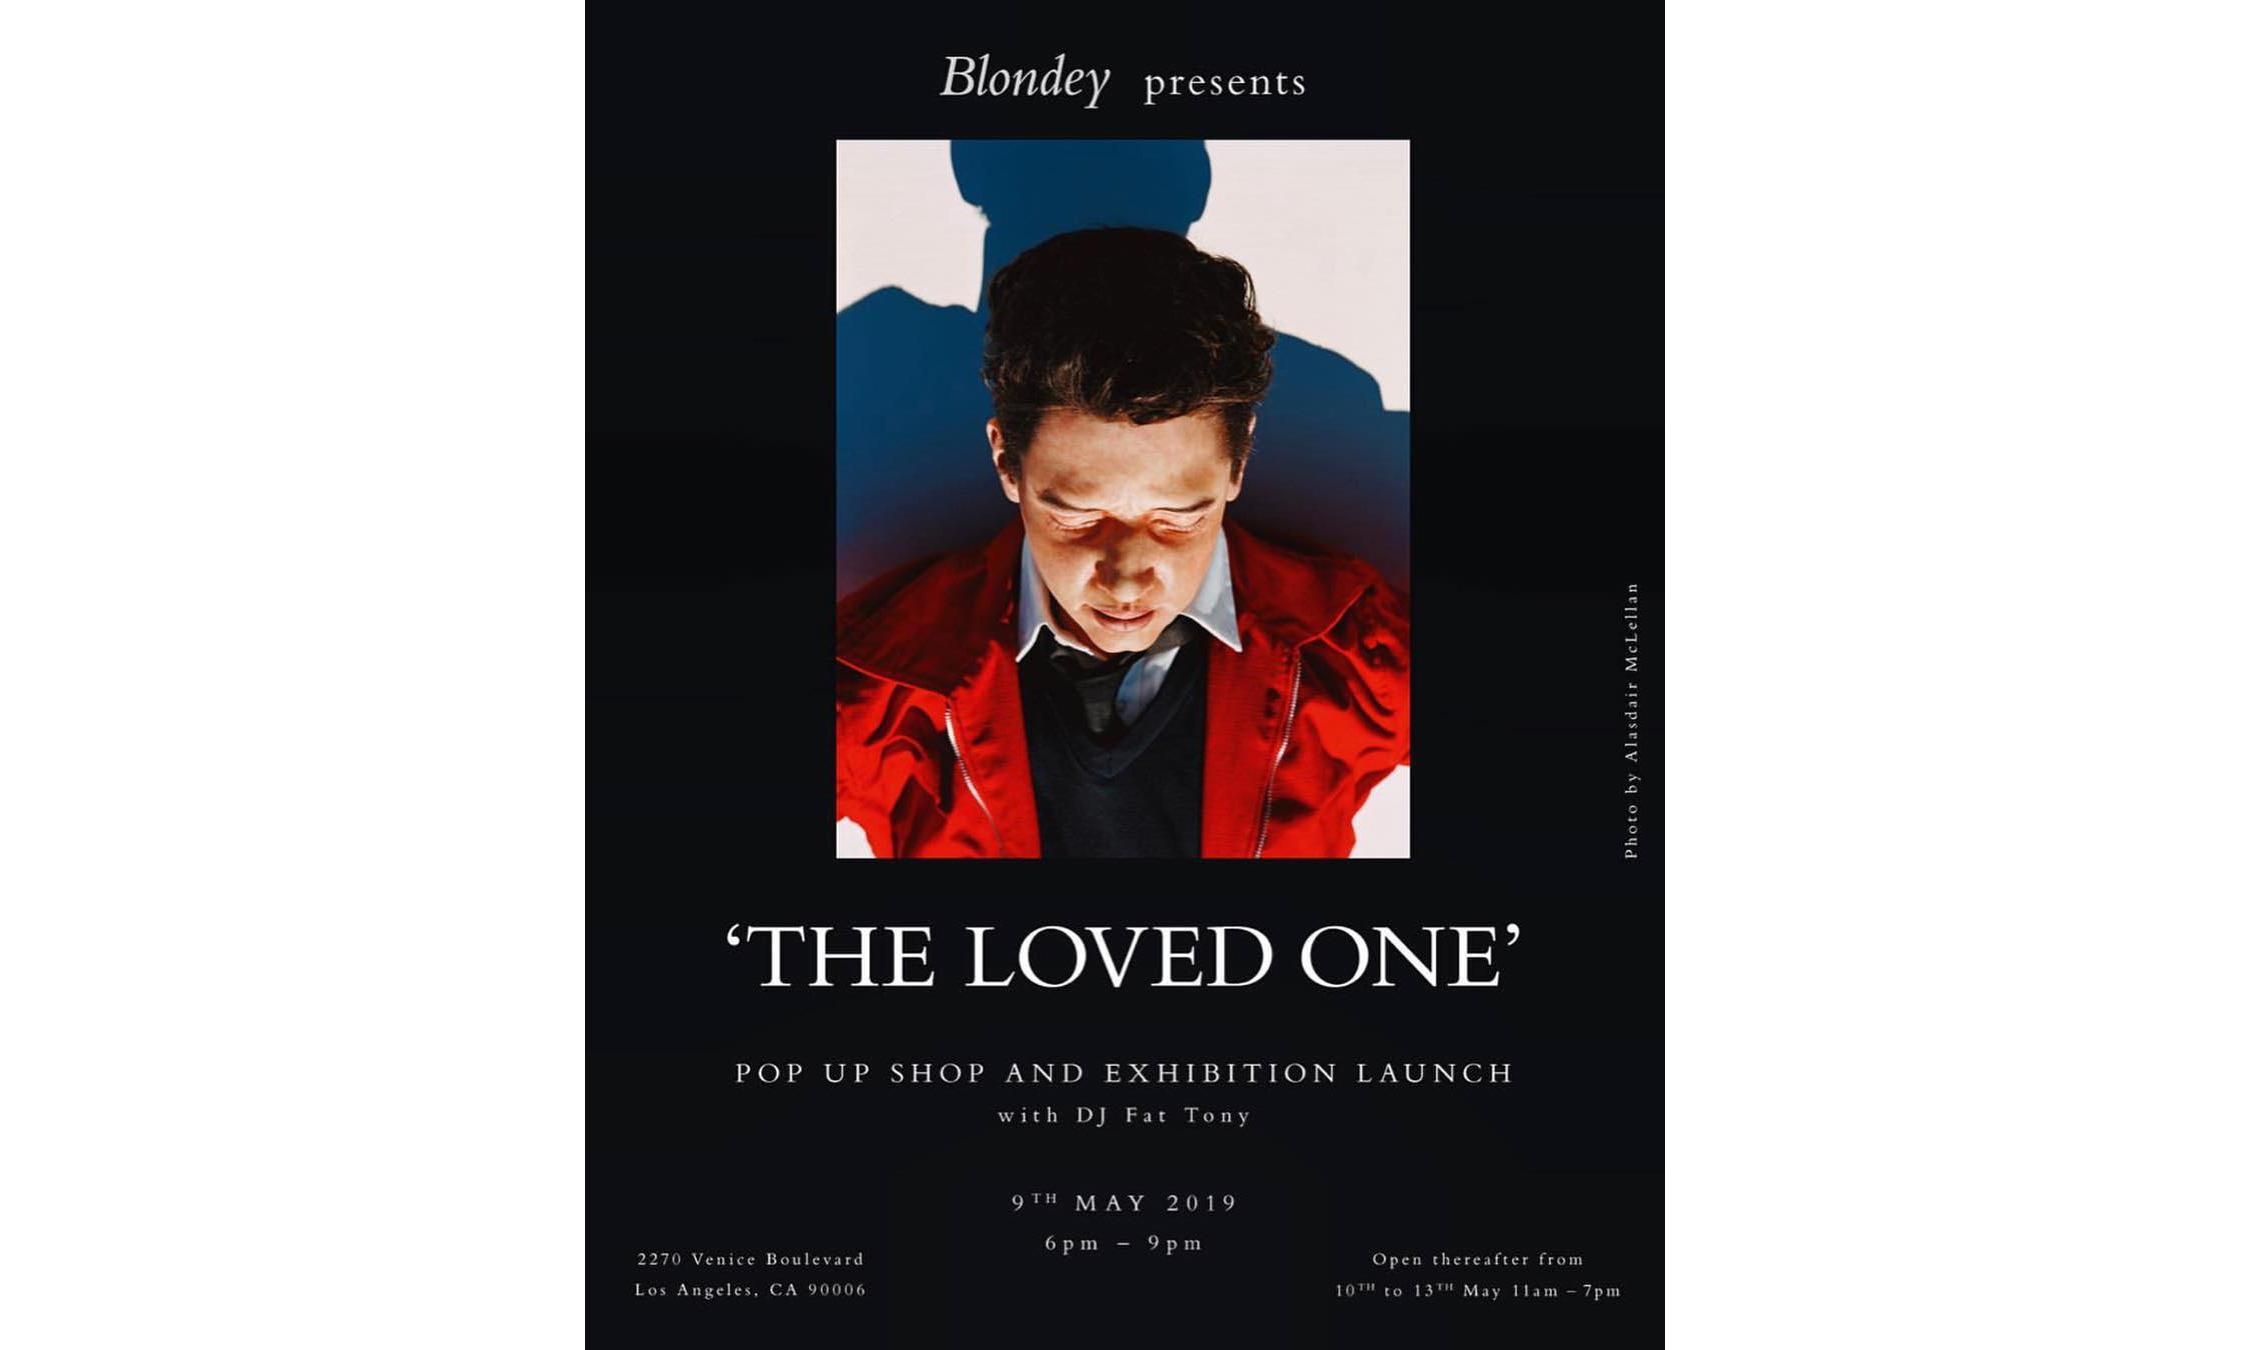 Blondey McCoy 将于洛杉矶办展并发售服饰单品